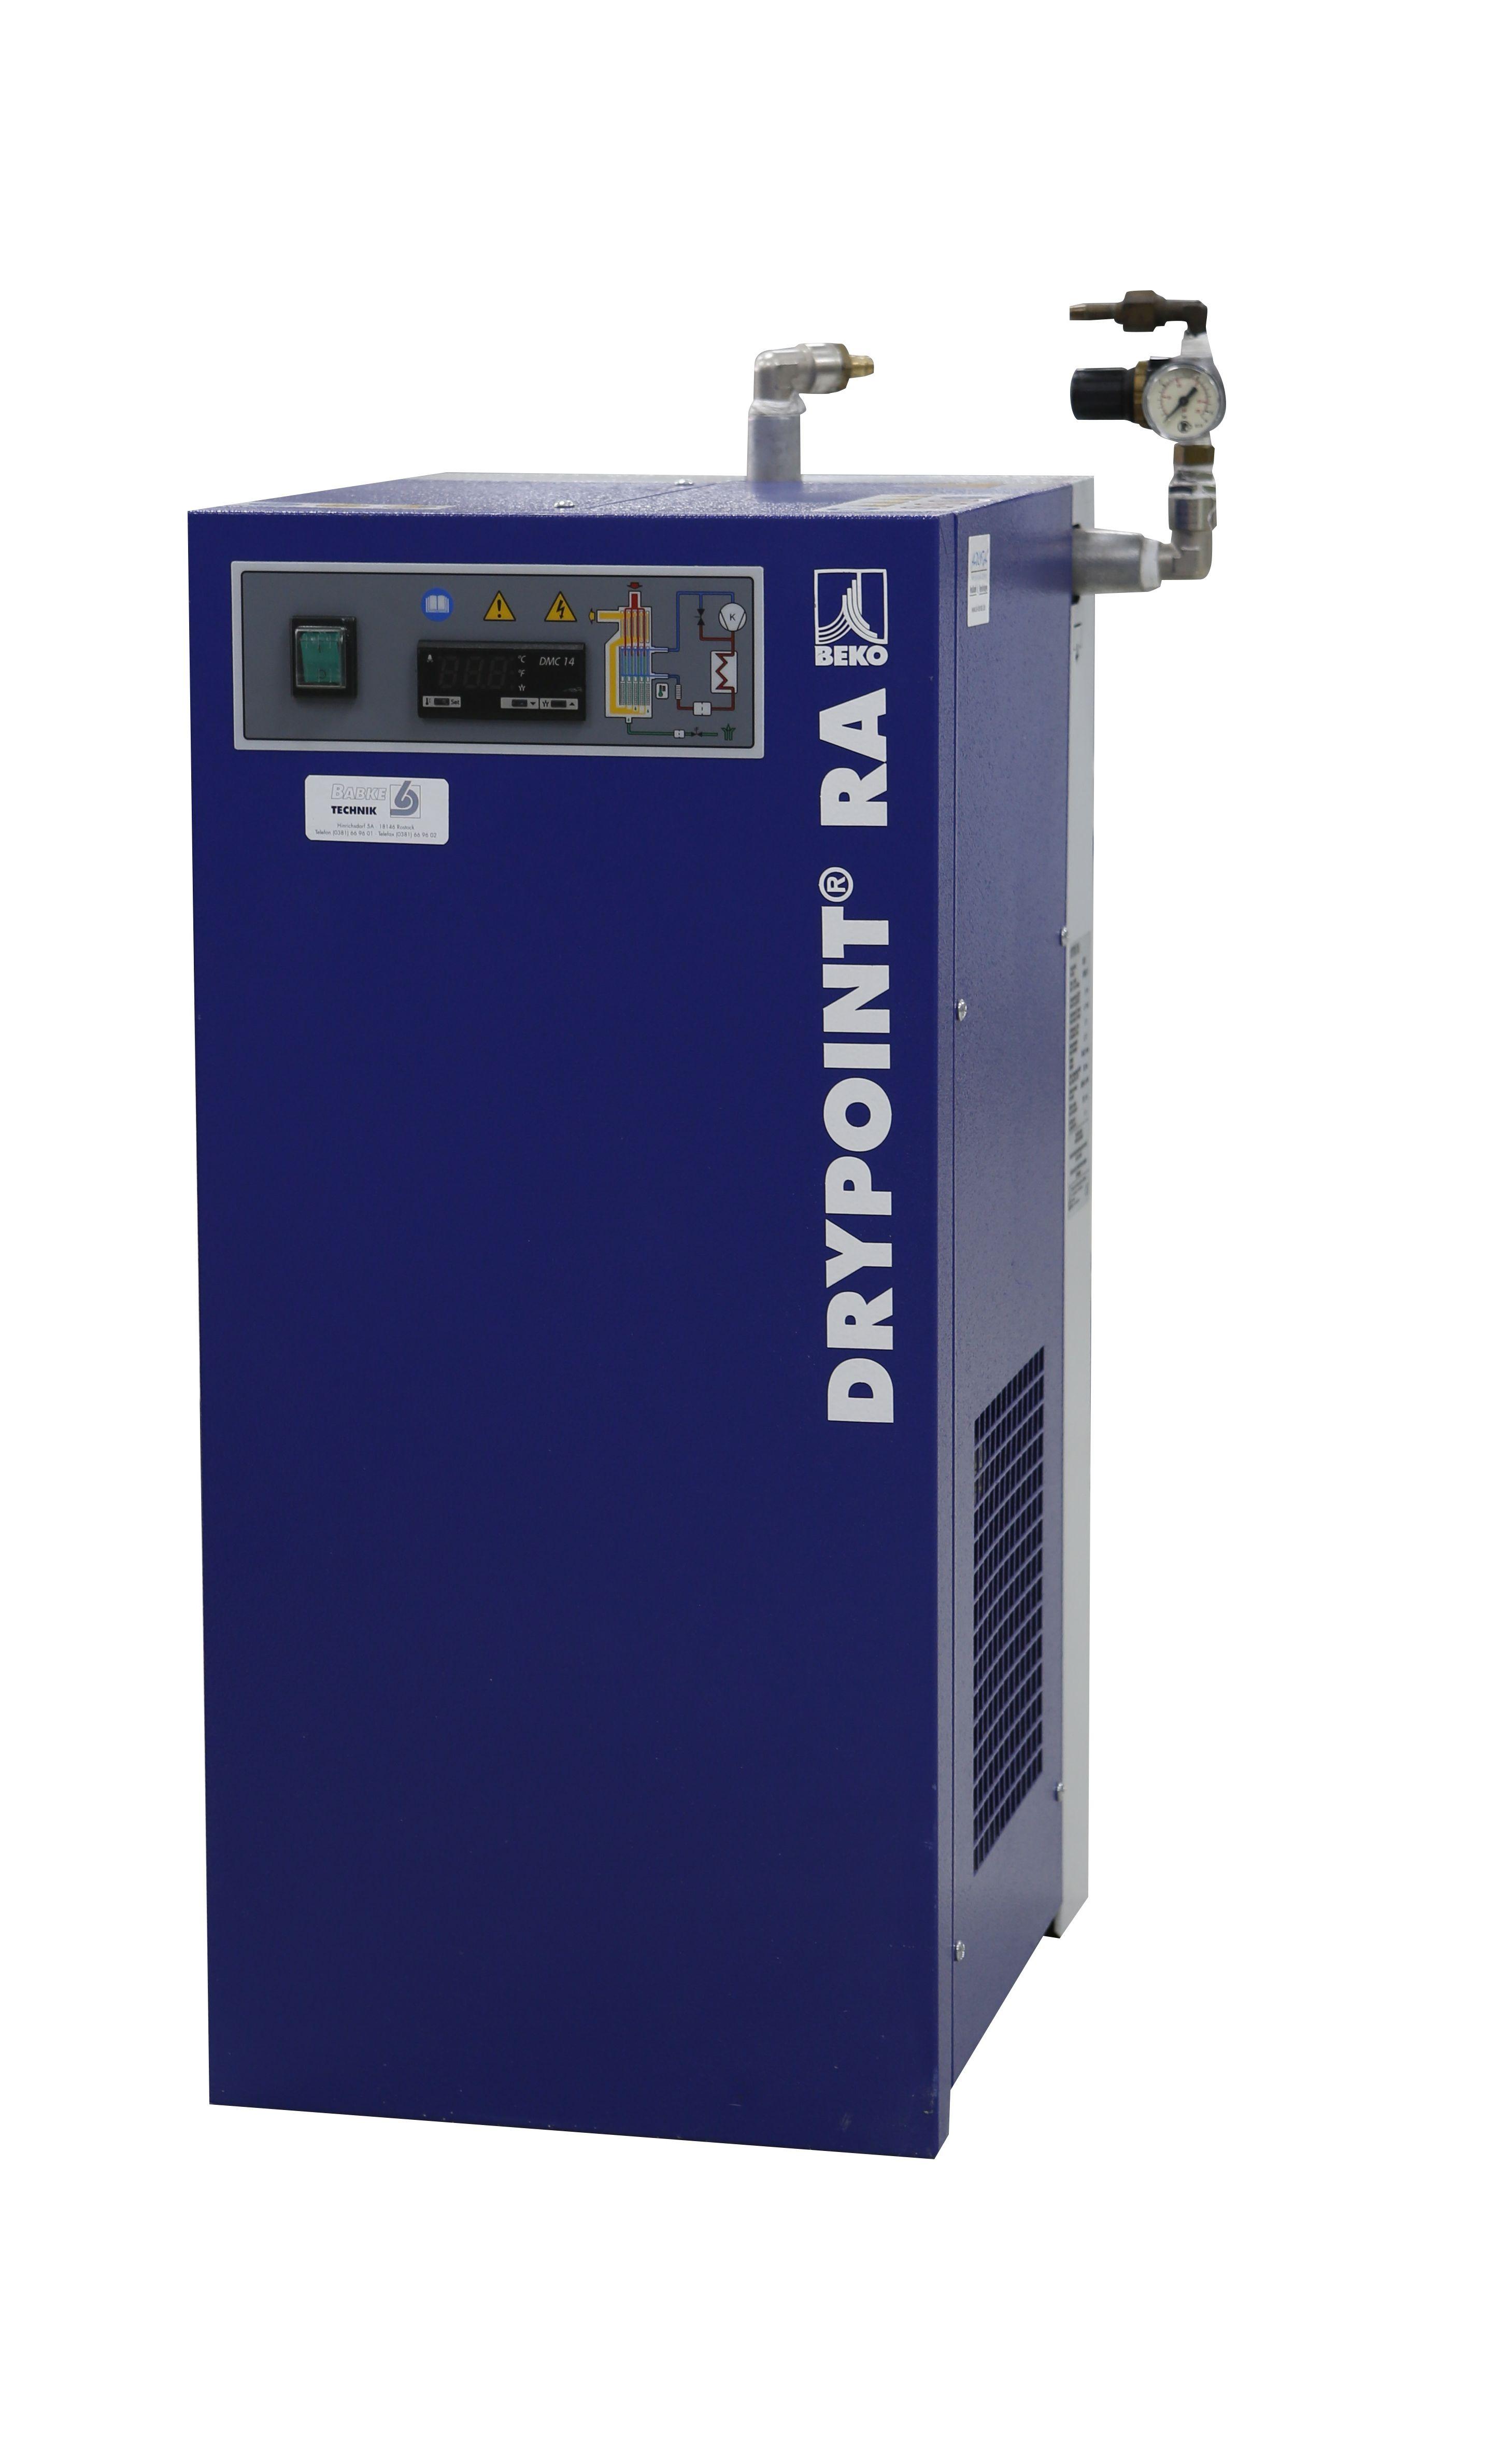 BEKO Kälte-Drucklufttrockner Typ DRYPOINT RA5